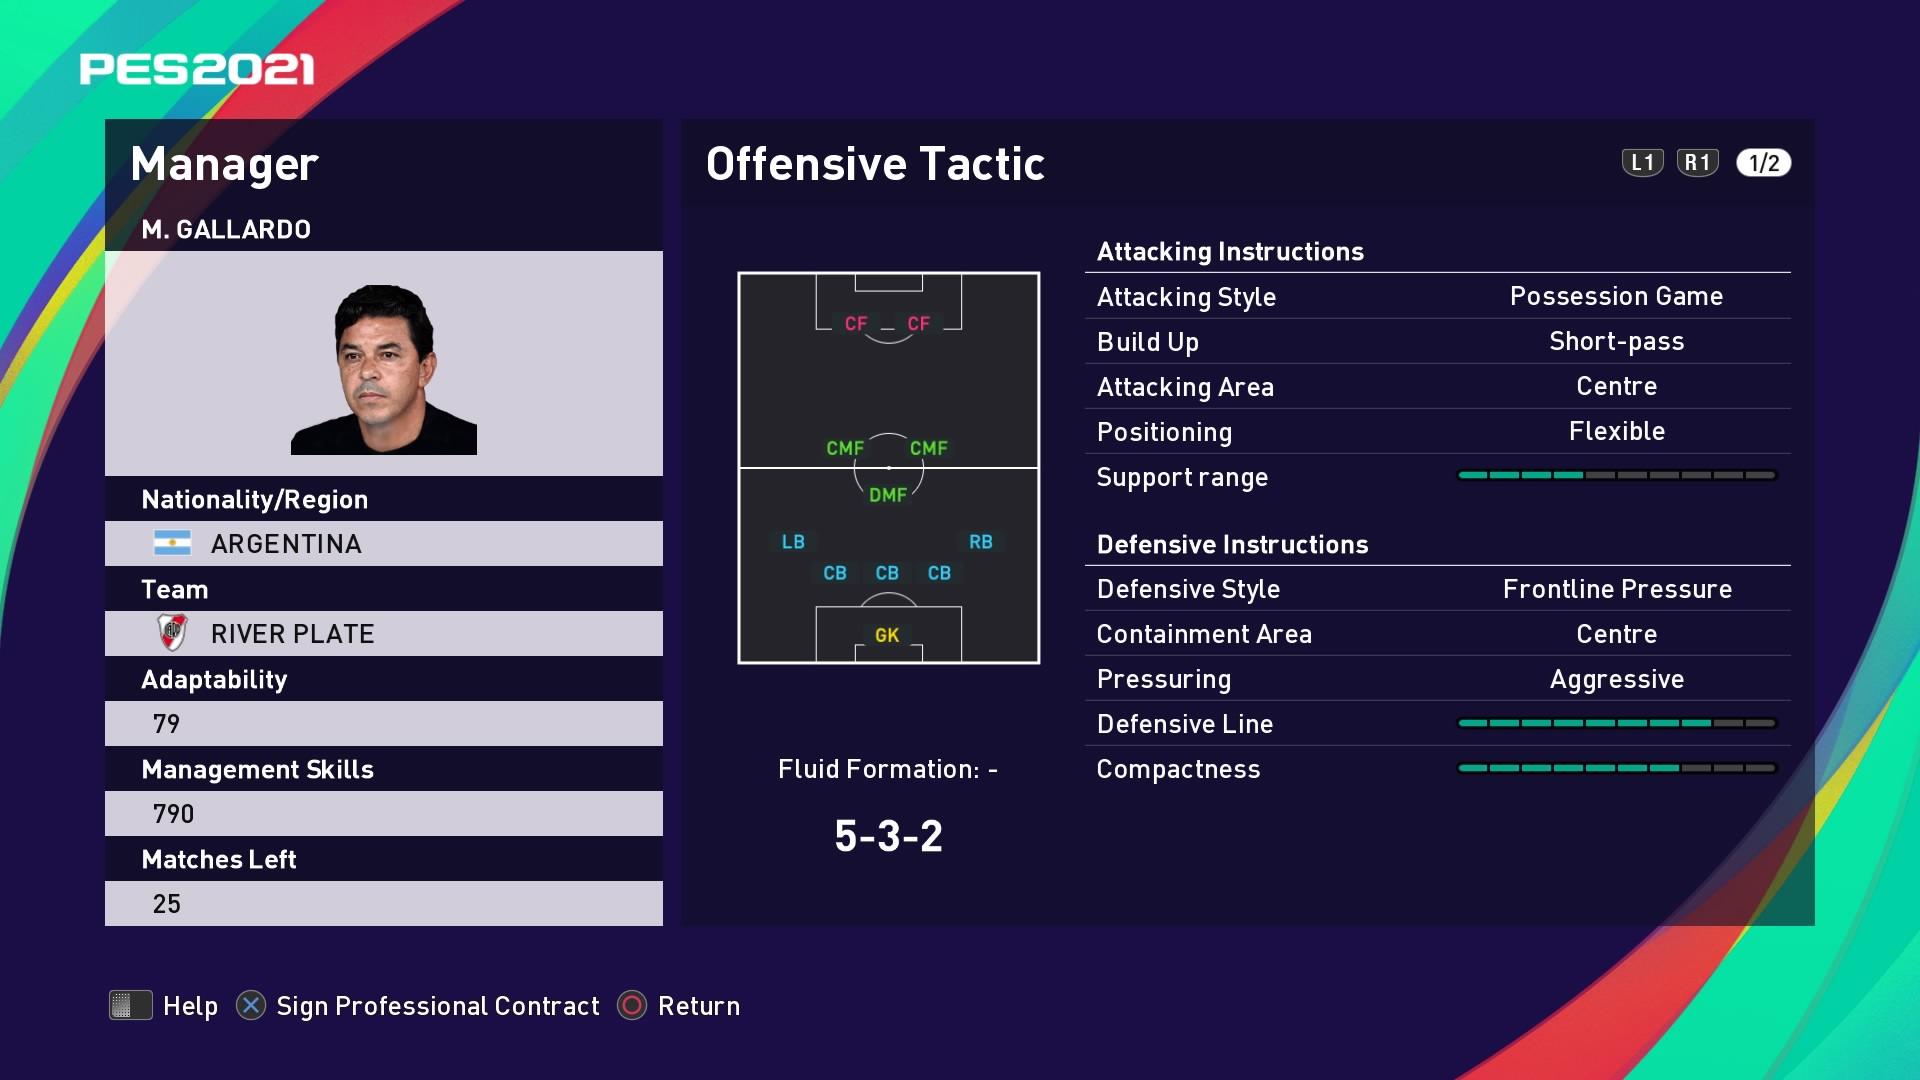 M. Gallardo (Marcelo Gallardo) Offensive Tactic in PES 2021 myClub